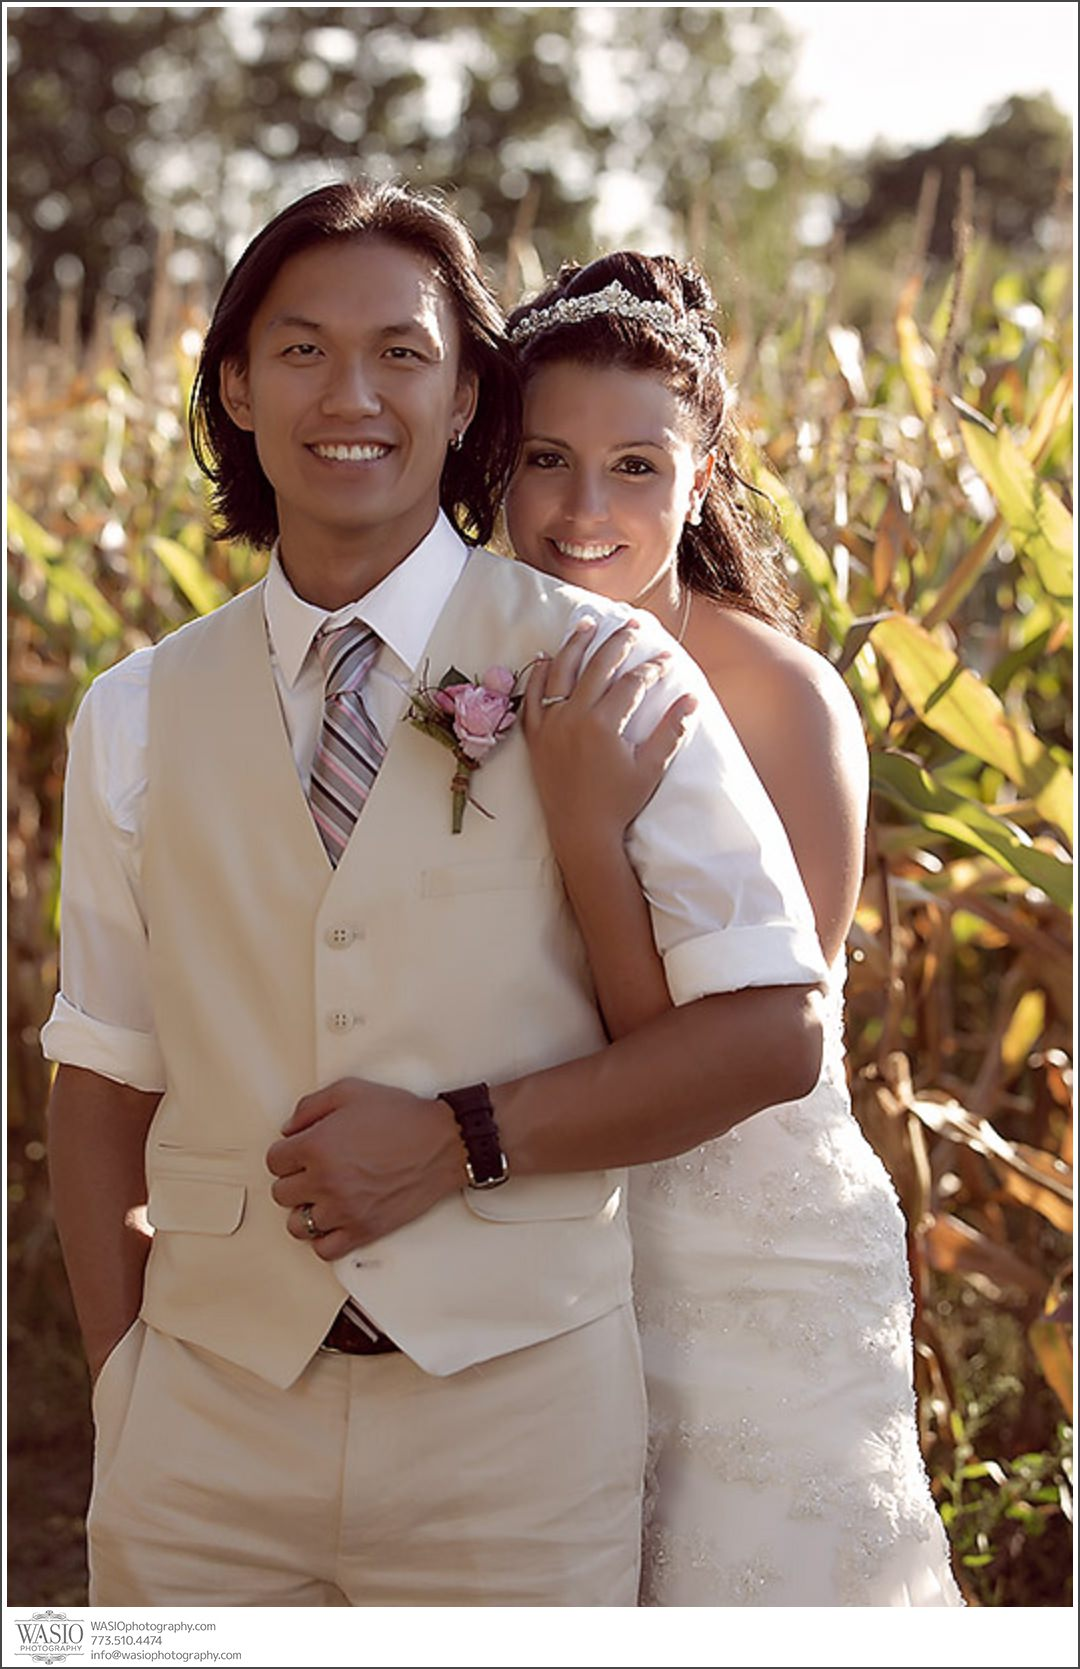 wedding-photography-in-indiana-090-modern-rustic-outdoor-portrait Wedding Photography in Indiana - Natalie + Jae